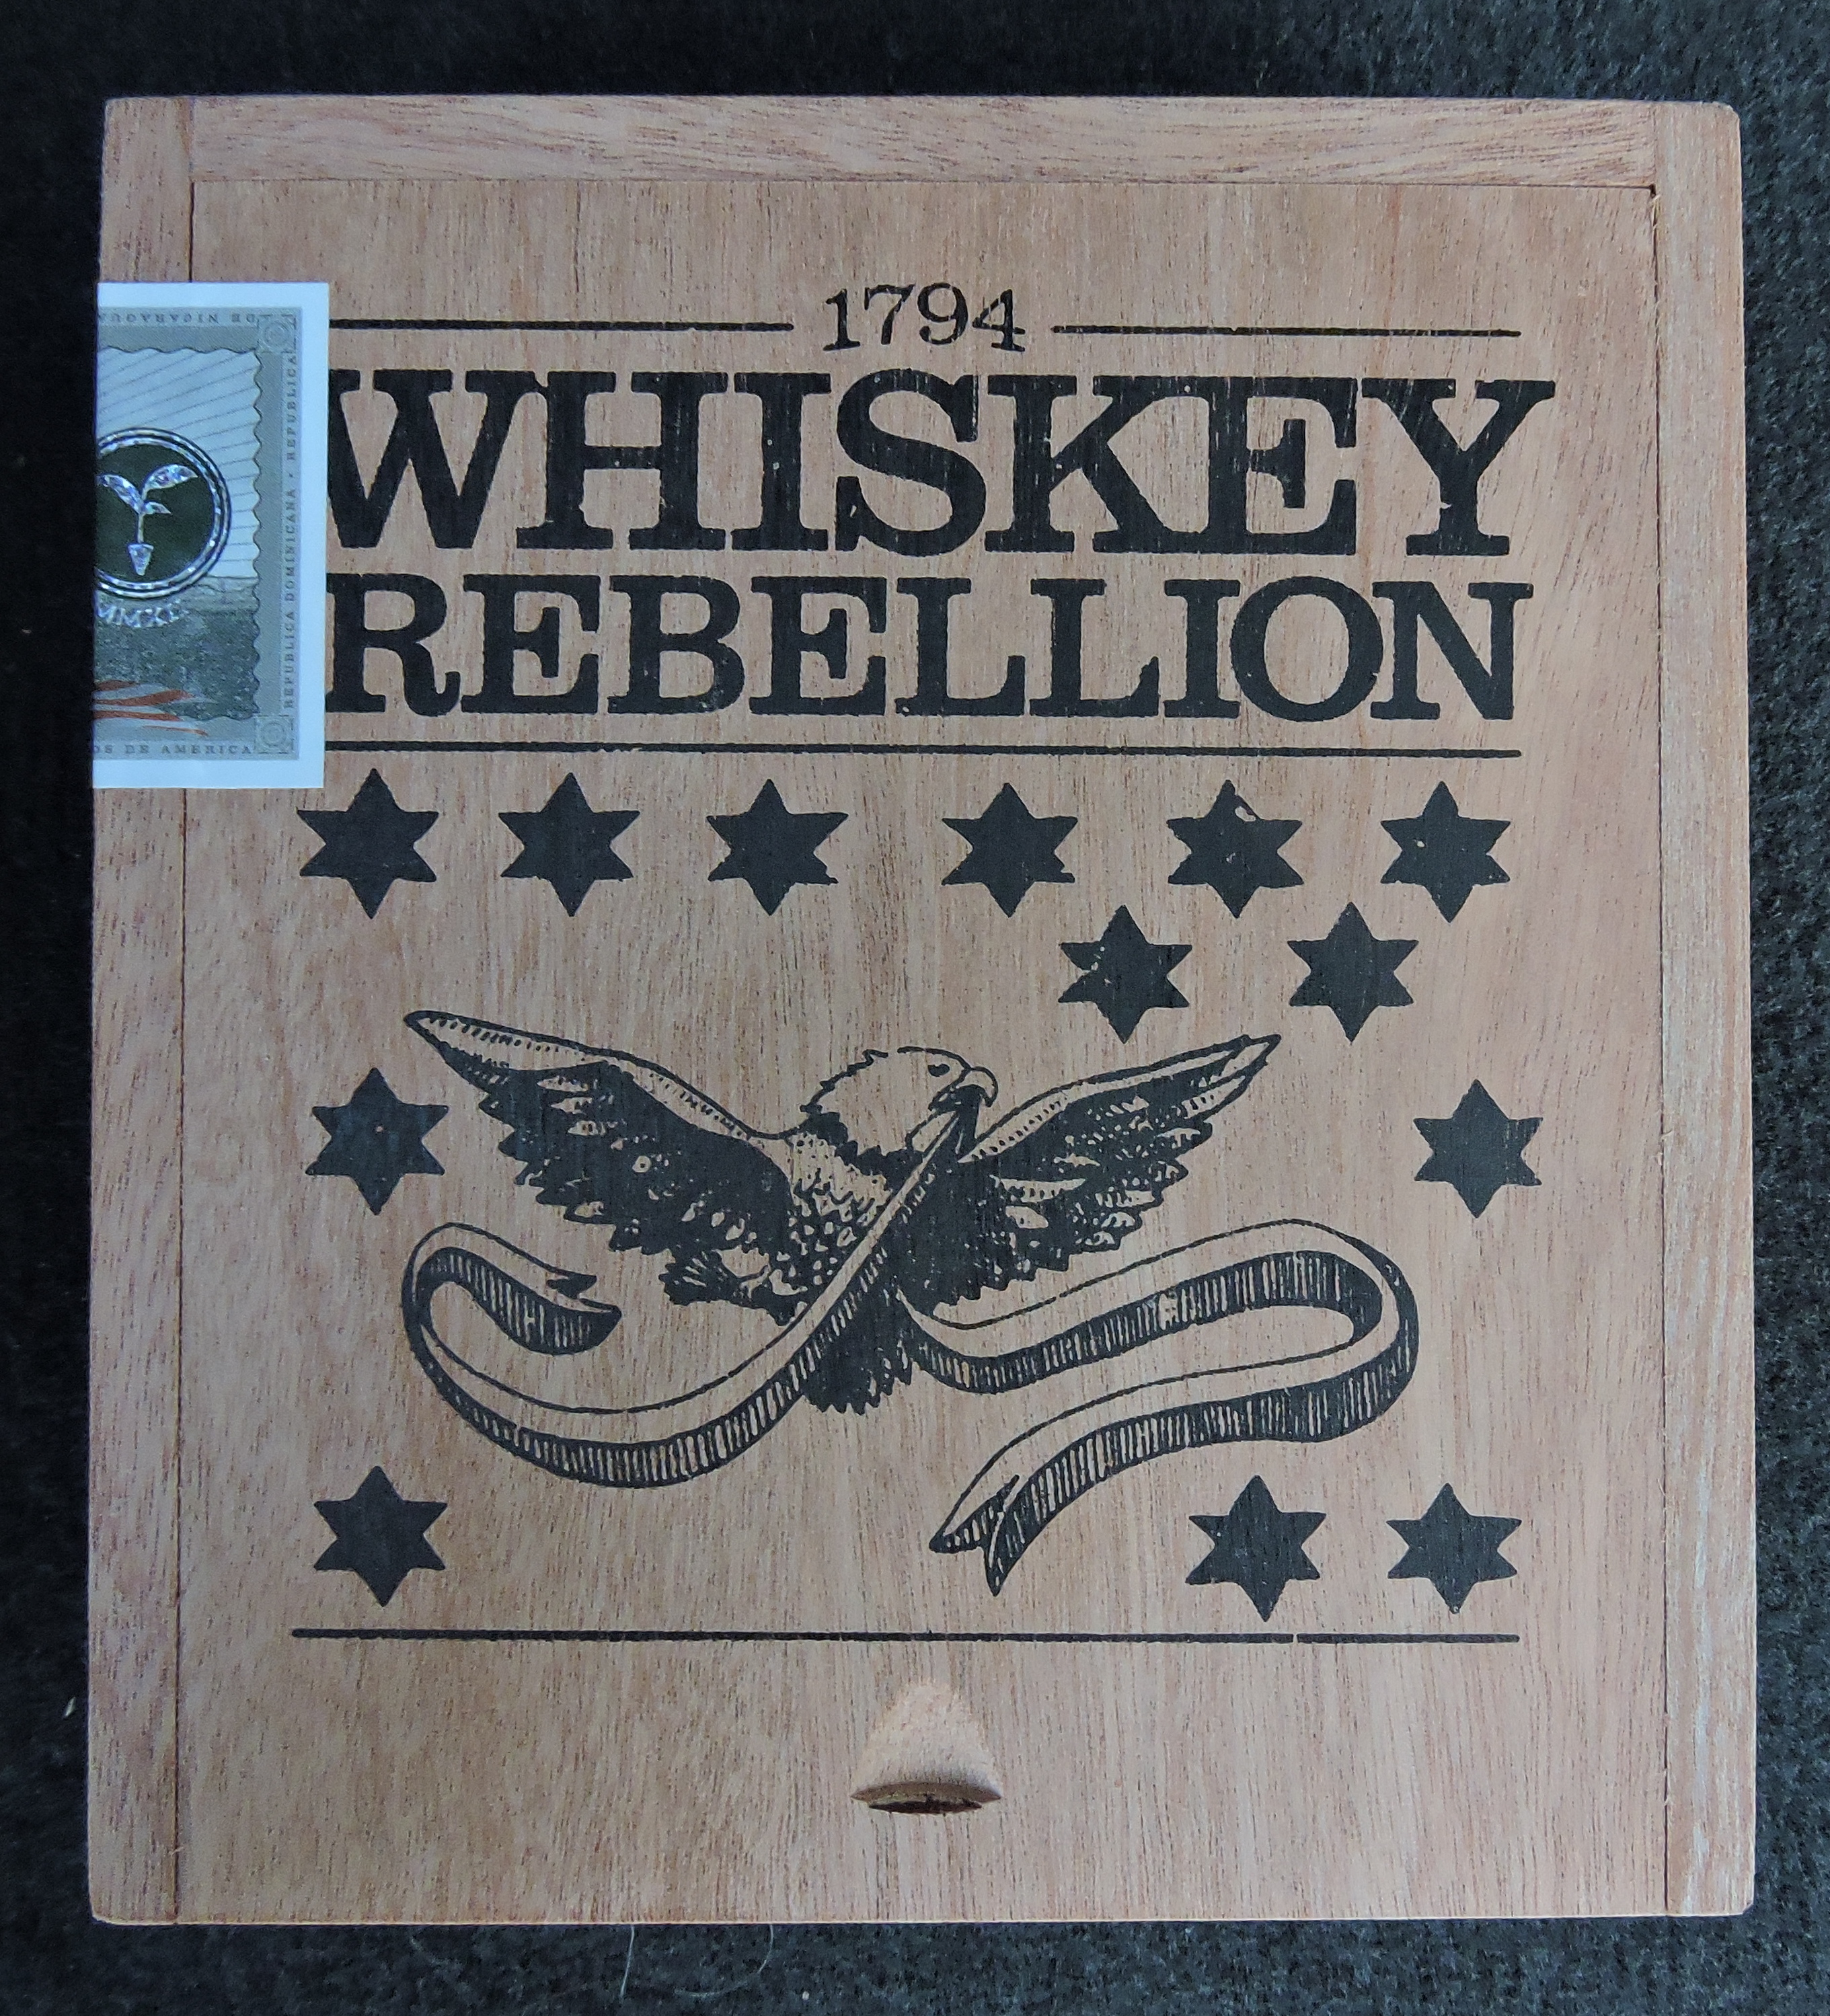 RoMa_Craft_Tobac_Whiskey_Rebellion_1794_Box-Top